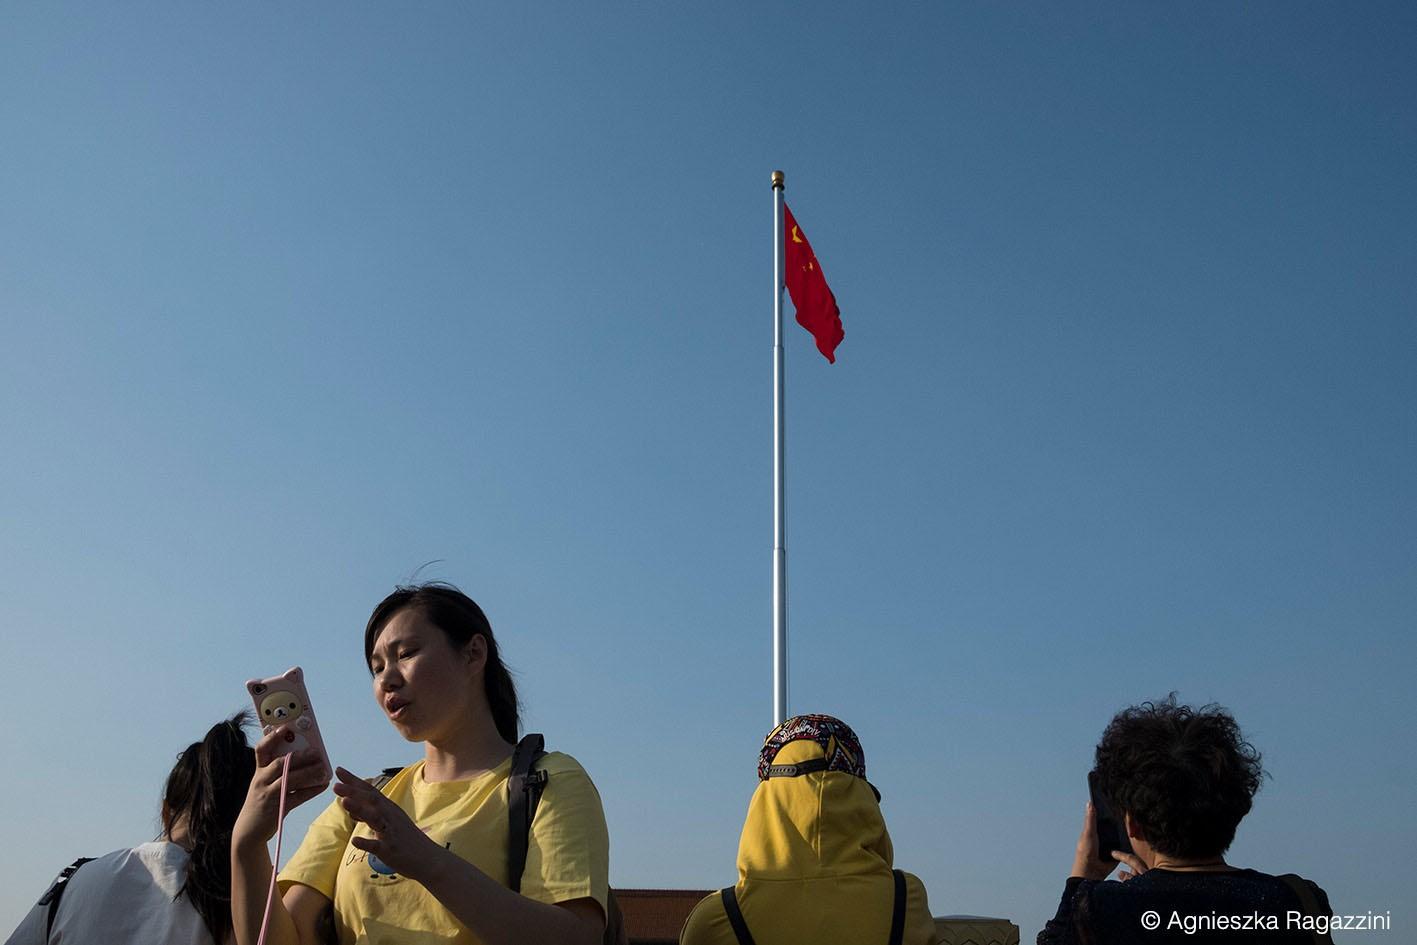 Beijing Street Photography Masterclass, critique session, Street Photography, photography workshop, photography masterclass, photographers, photography skills, street photography workshop, Tokyo street photography masterclass, Tokyo street photography workshop, China, Tiananmen Square, Forbidden City